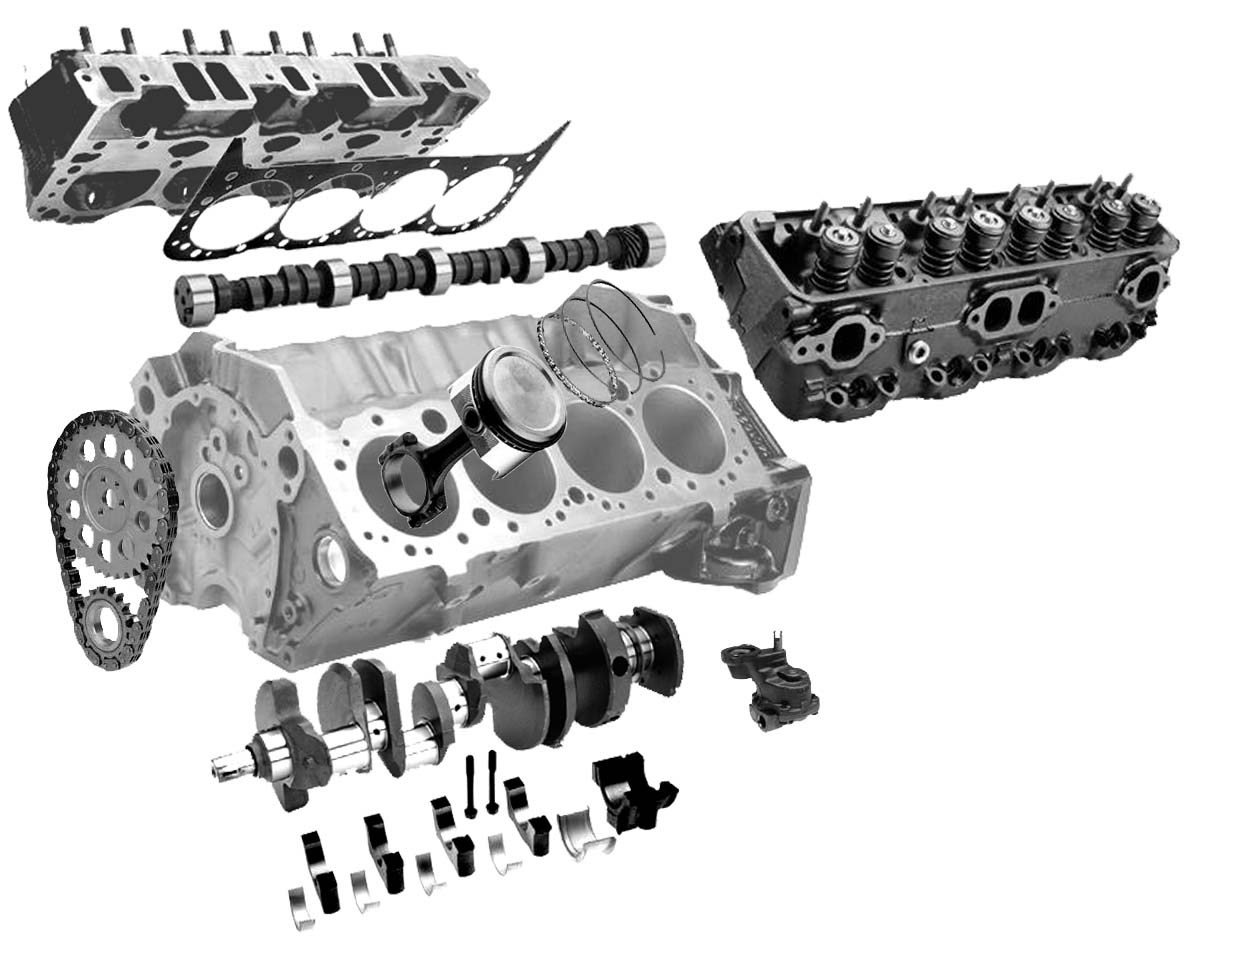 Korean Genuine Doosan/daewoo Engine Spare Parts